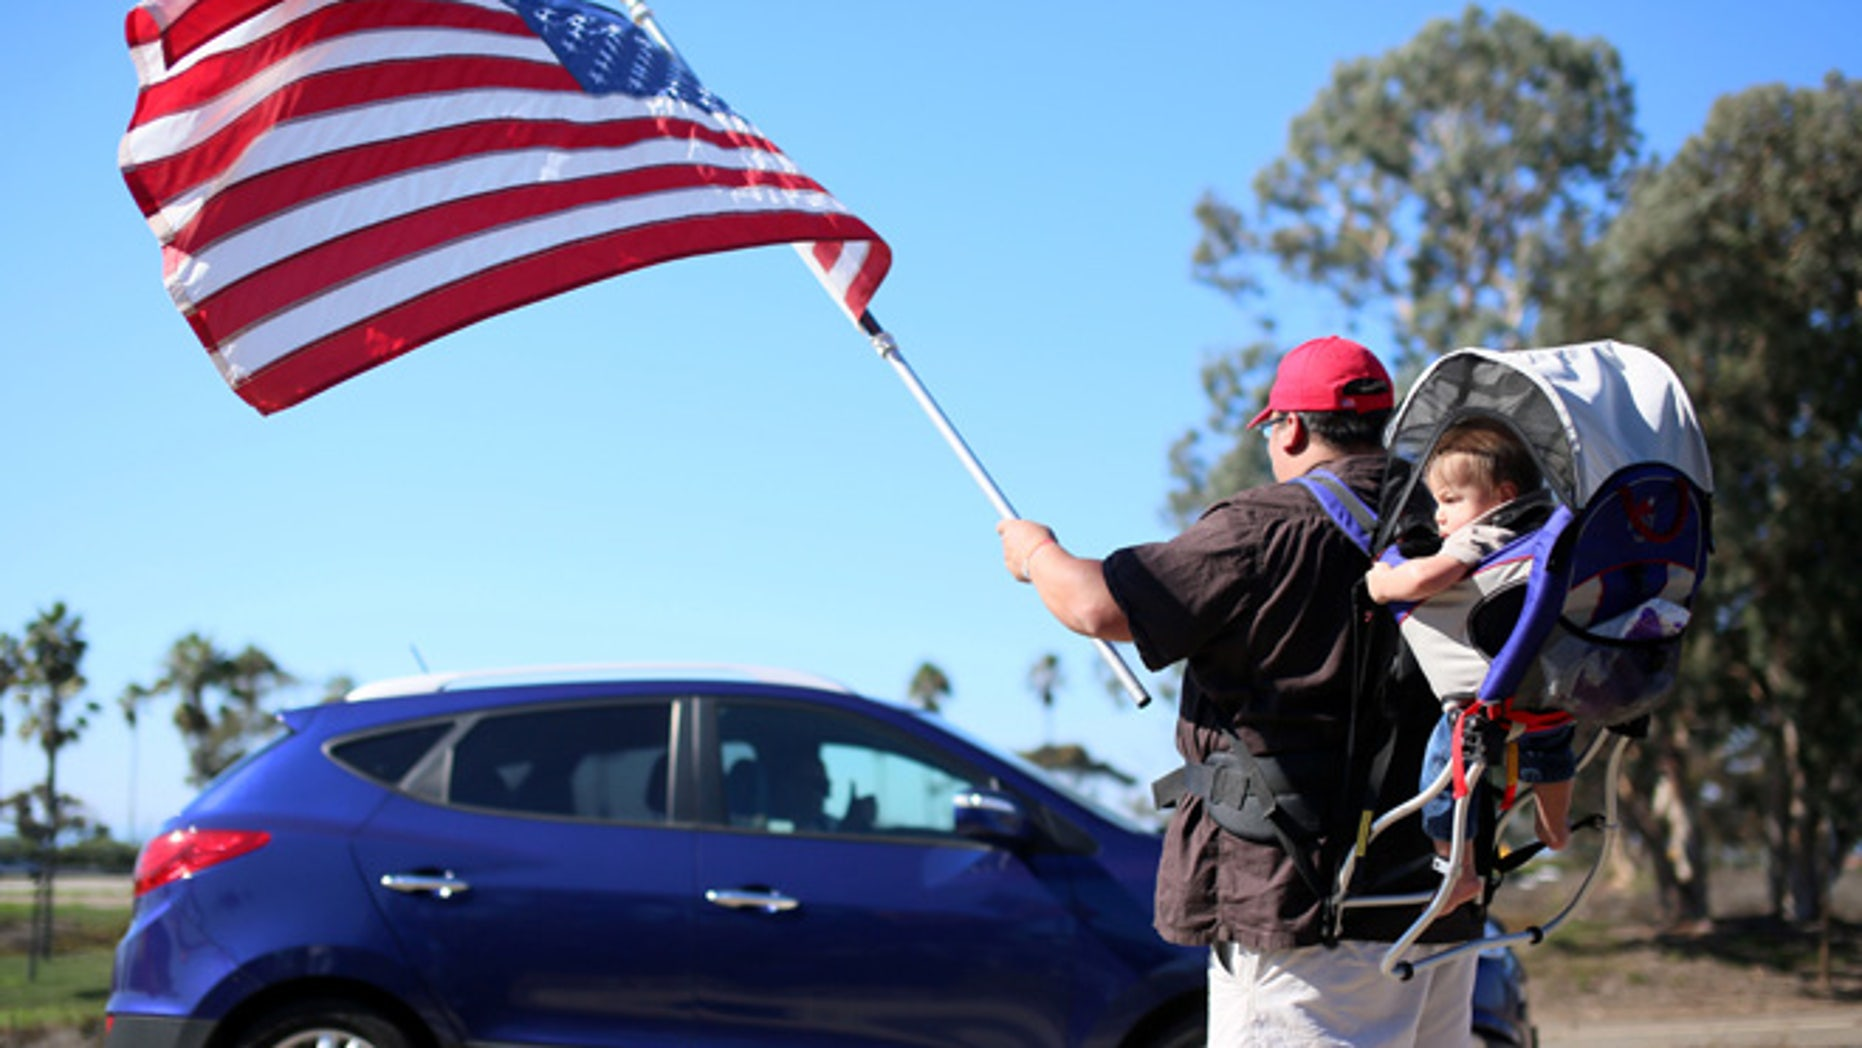 Demonstrator Steven Morales with his son Steven Jr. waves an American flag for motorists in support of President elect Donald Trump outside of Camp Pendleton in Oceanside, California, U.S. November 11, 2016.  REUTERS/Sandy Huffaker - RTX2TA95